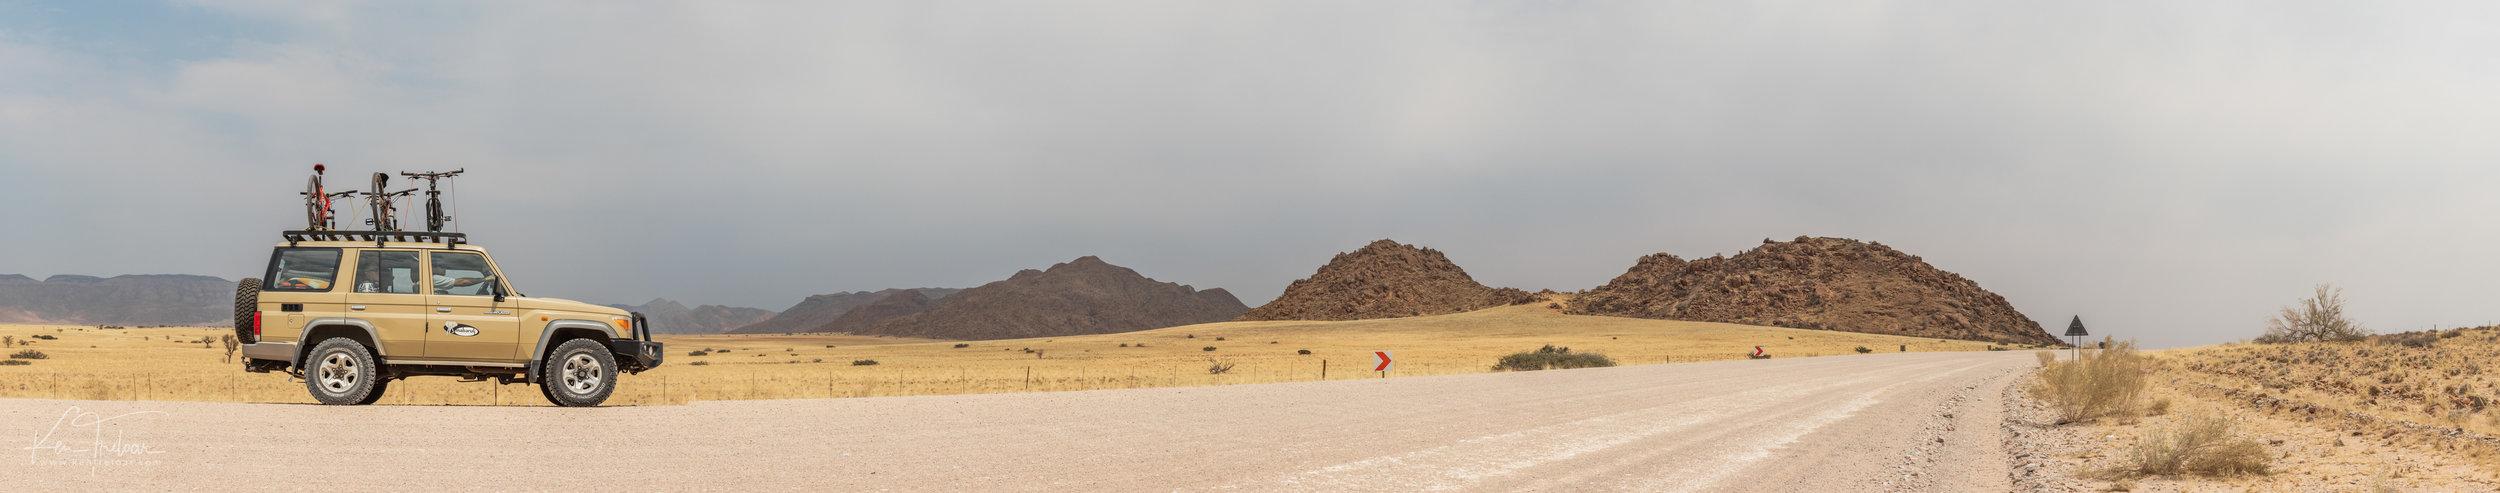 Namibian Grassland Pass 1 (shot hand-held) Camera: Canon 200D Lens: 24-70mm f/4 L 1/640sec ; f/8.0 17985 x 3548